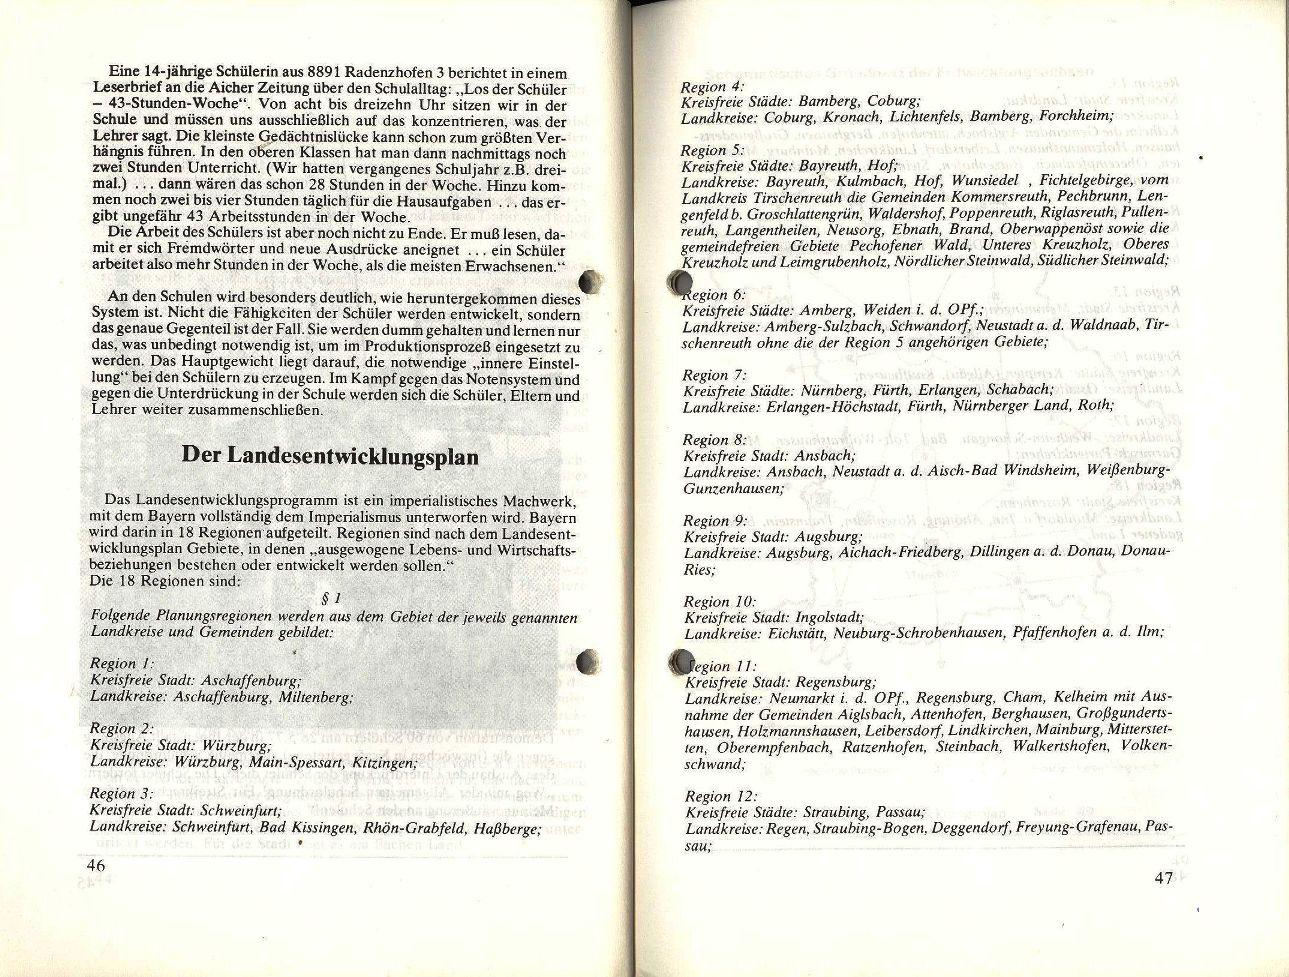 KBW_Augsburg025